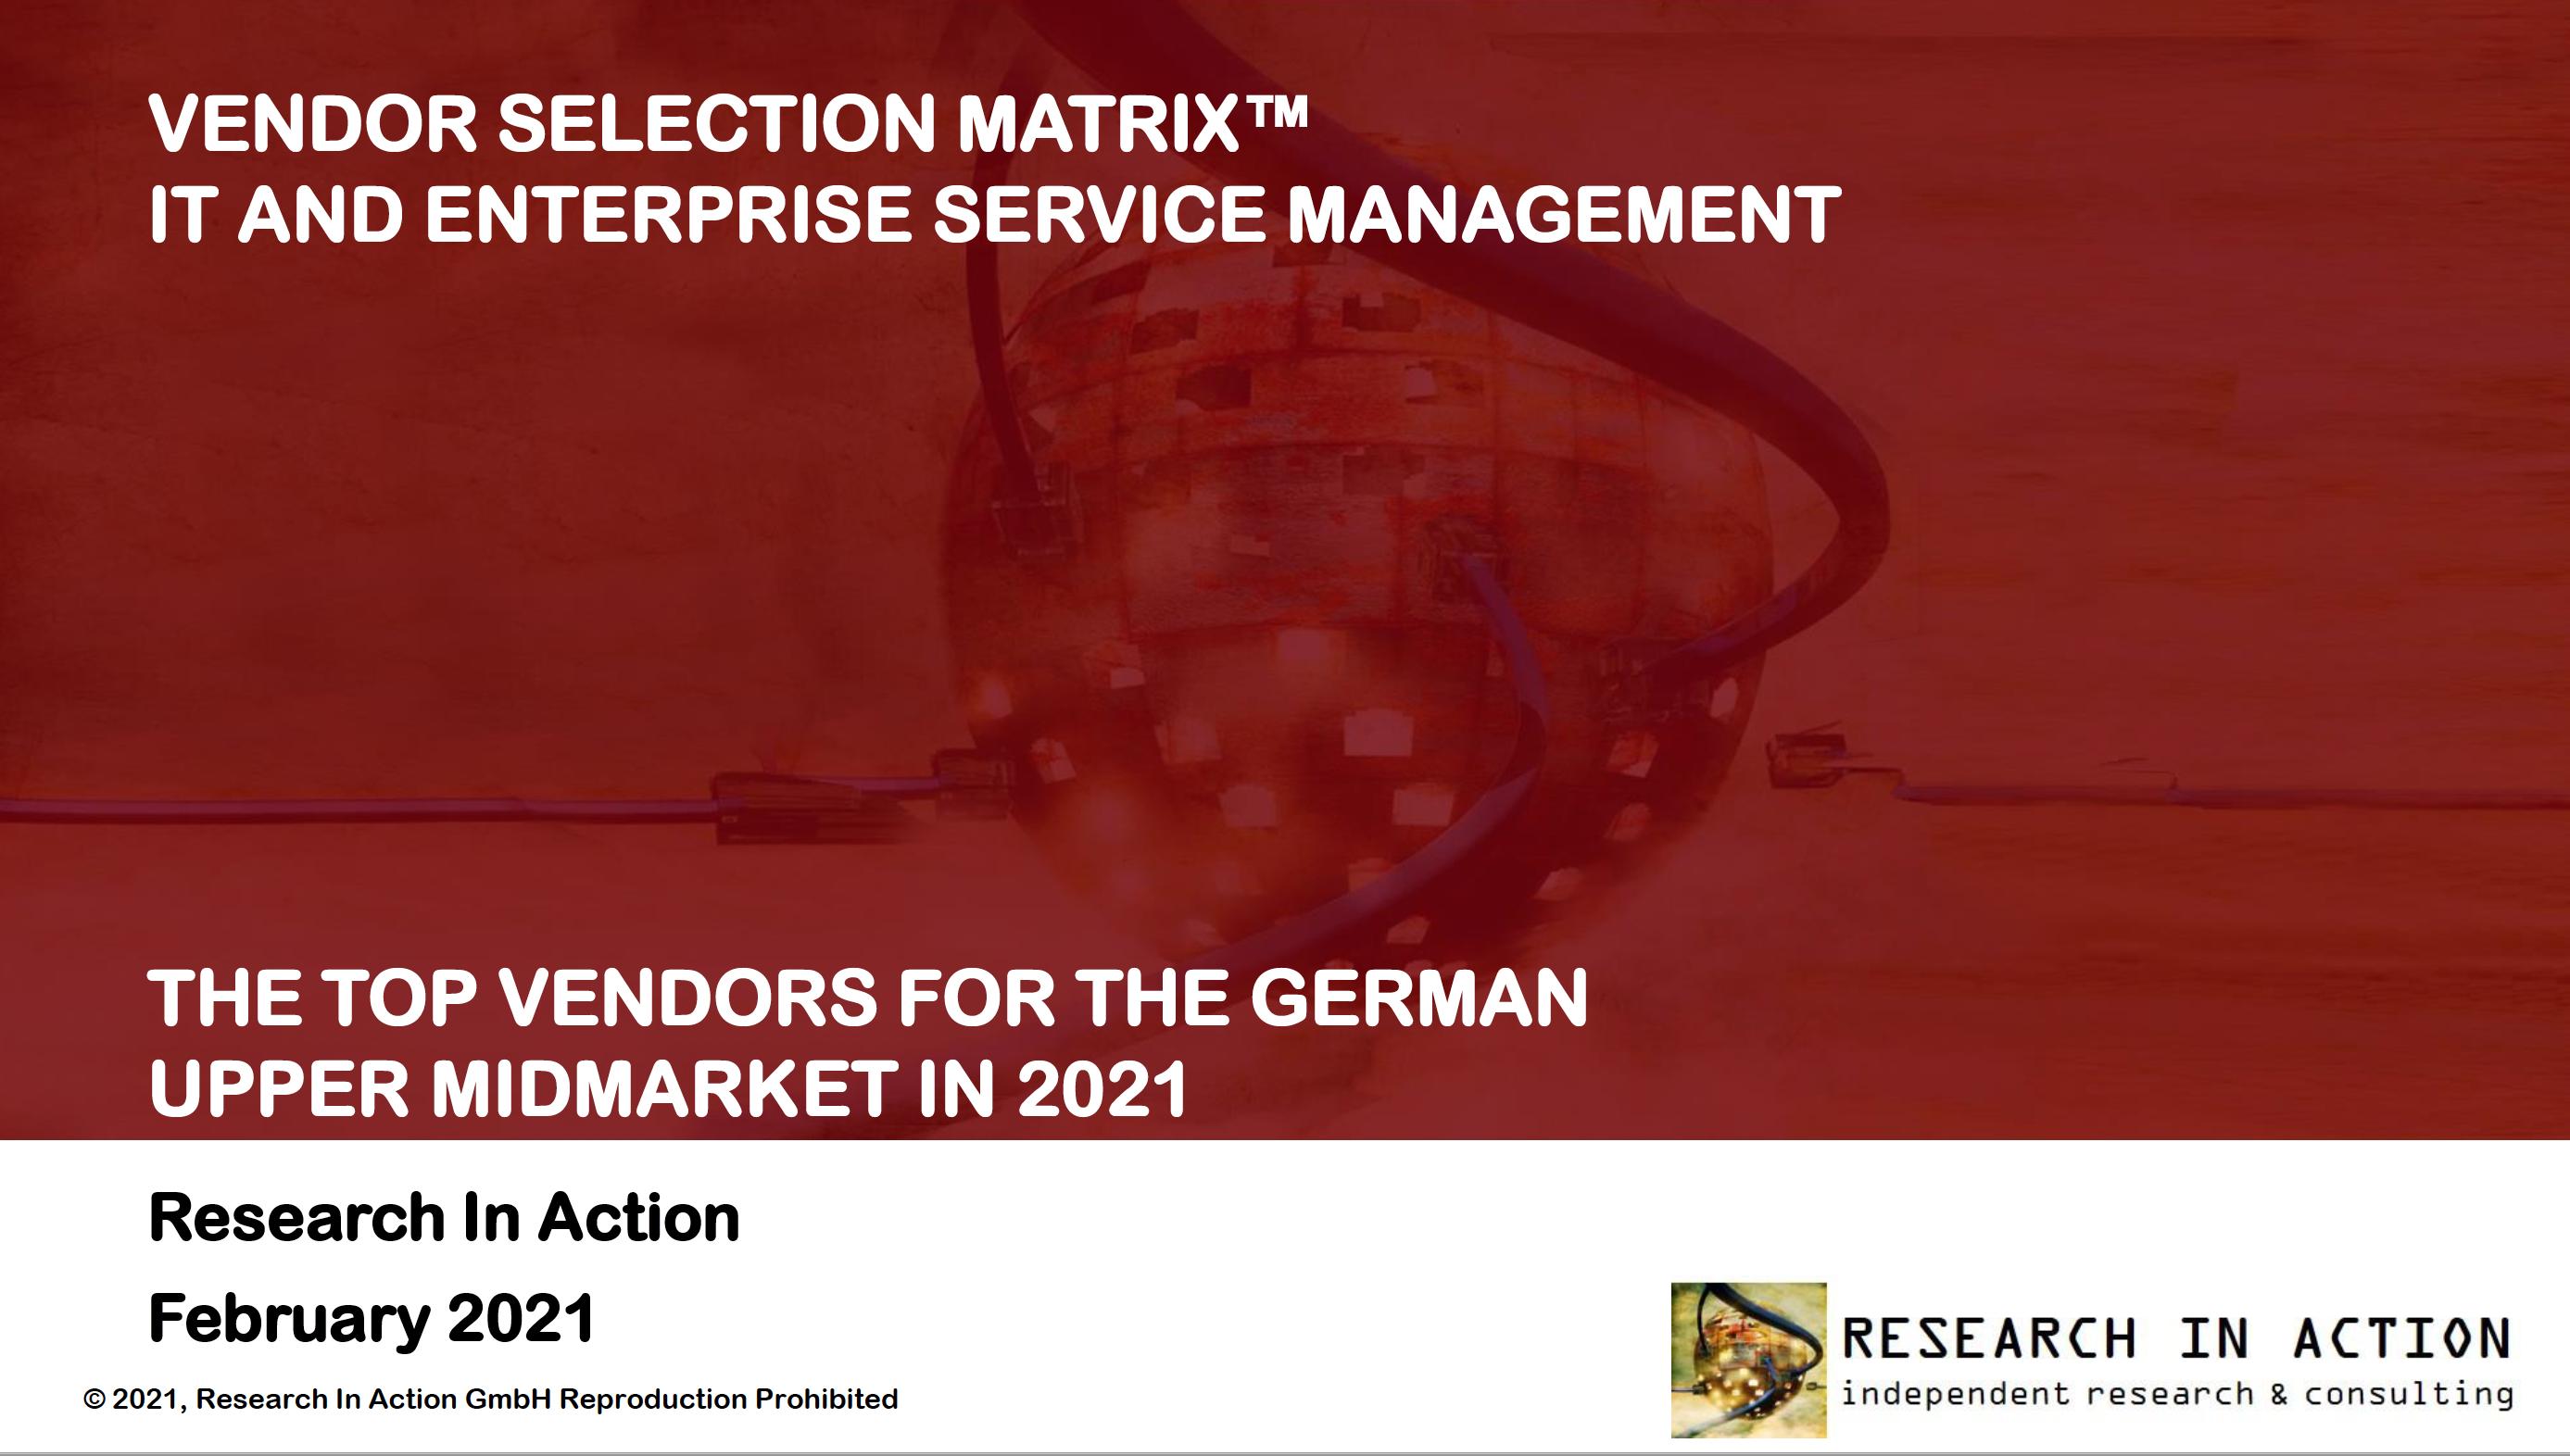 RIA Vendor Selection Matrix 2021